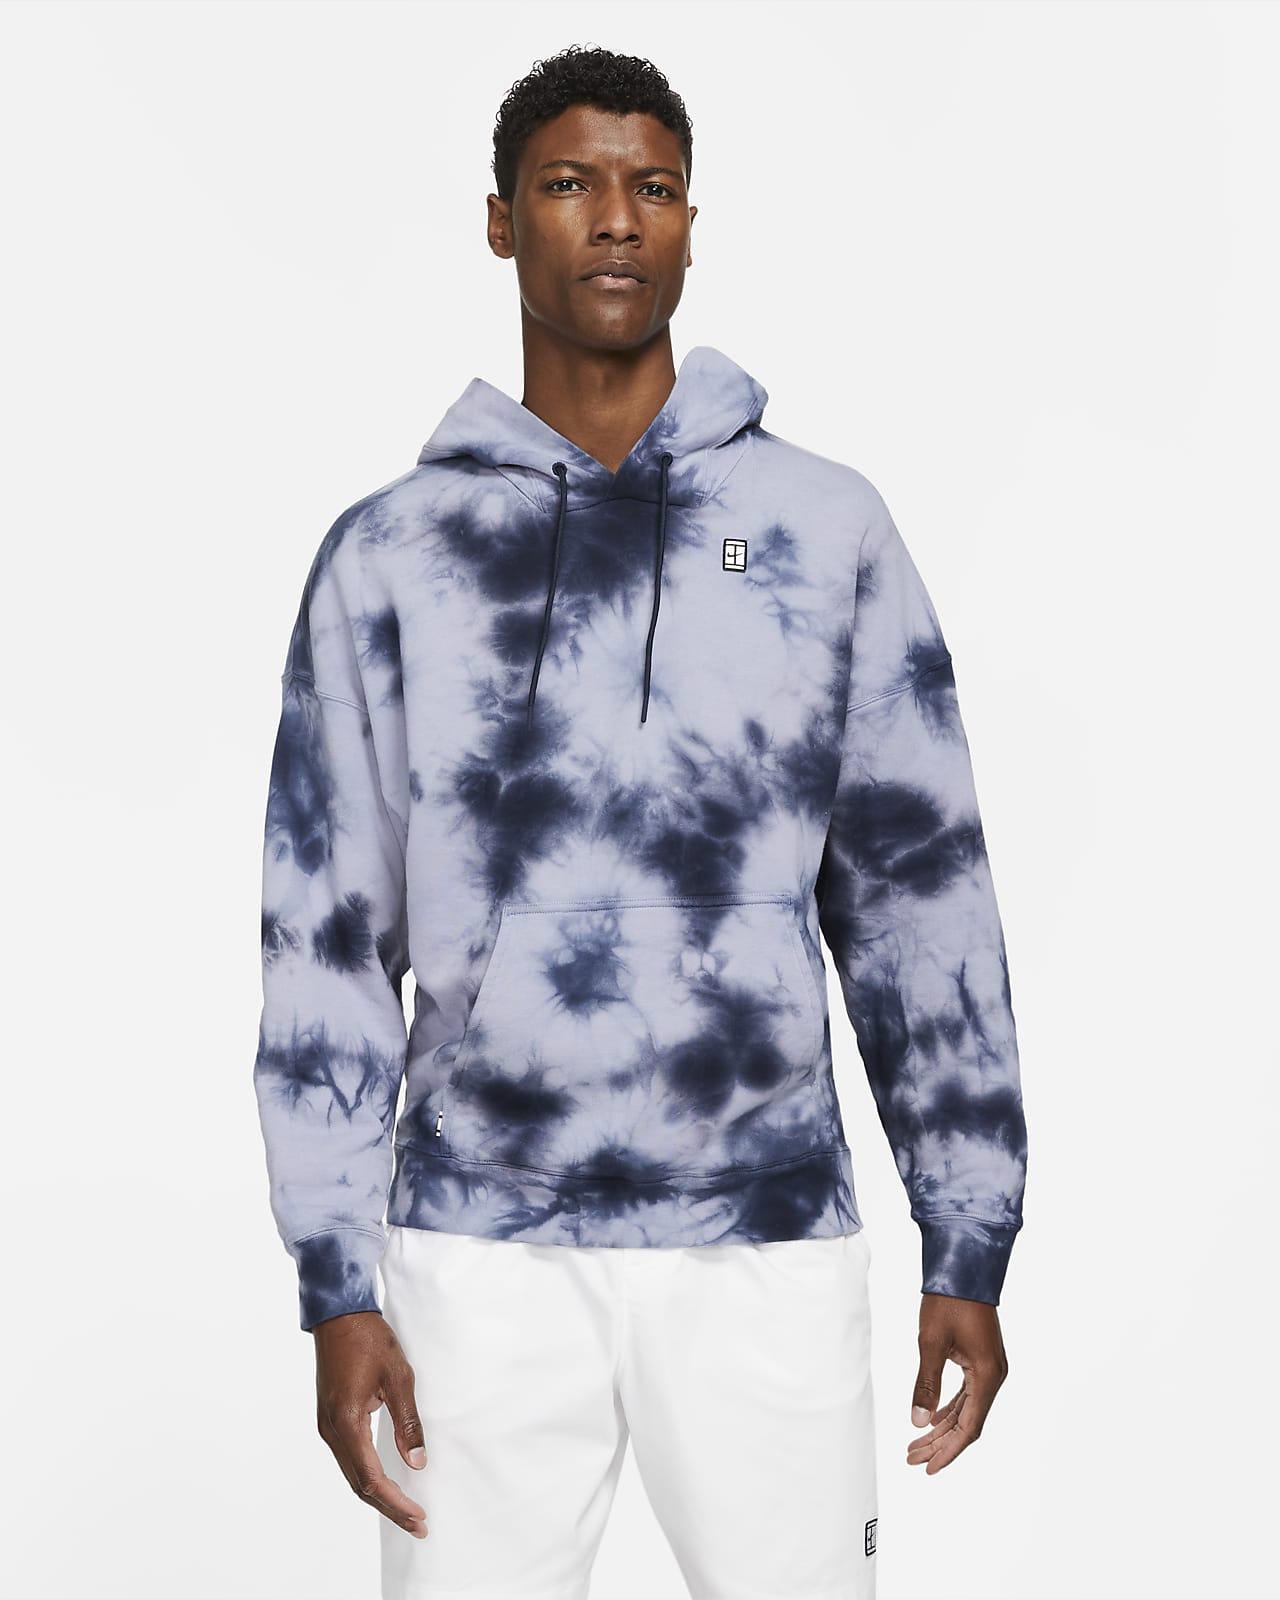 Sudadera con capucha de tenis desteñida de tejido Fleece para hombre NikeCourt